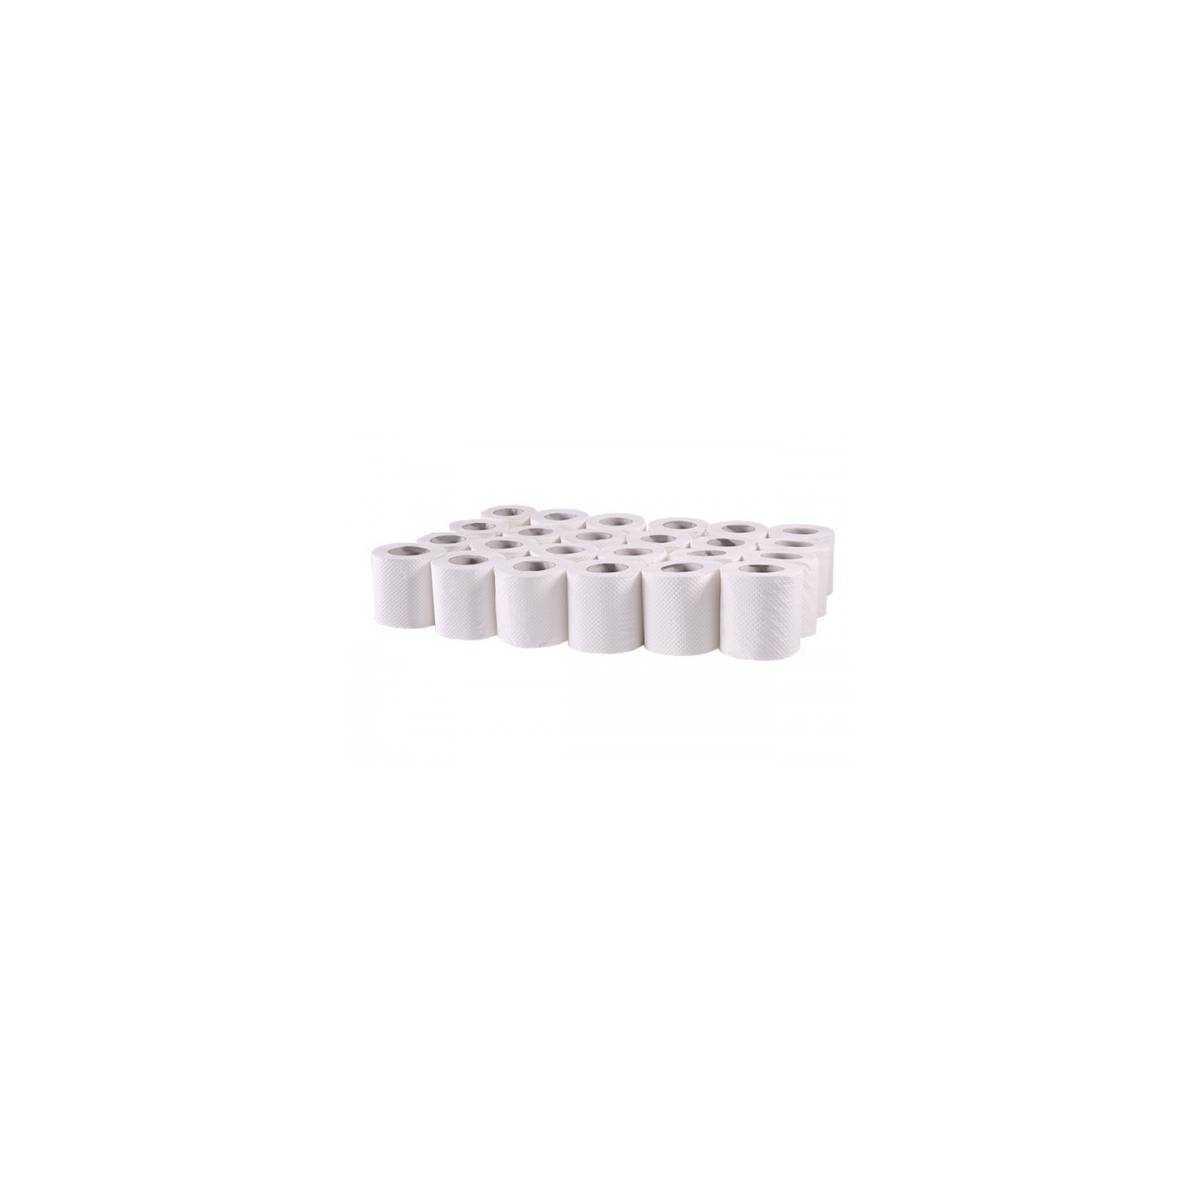 Туалетная бумага в рулоне STANDART (B950) B950 Tischa Papier